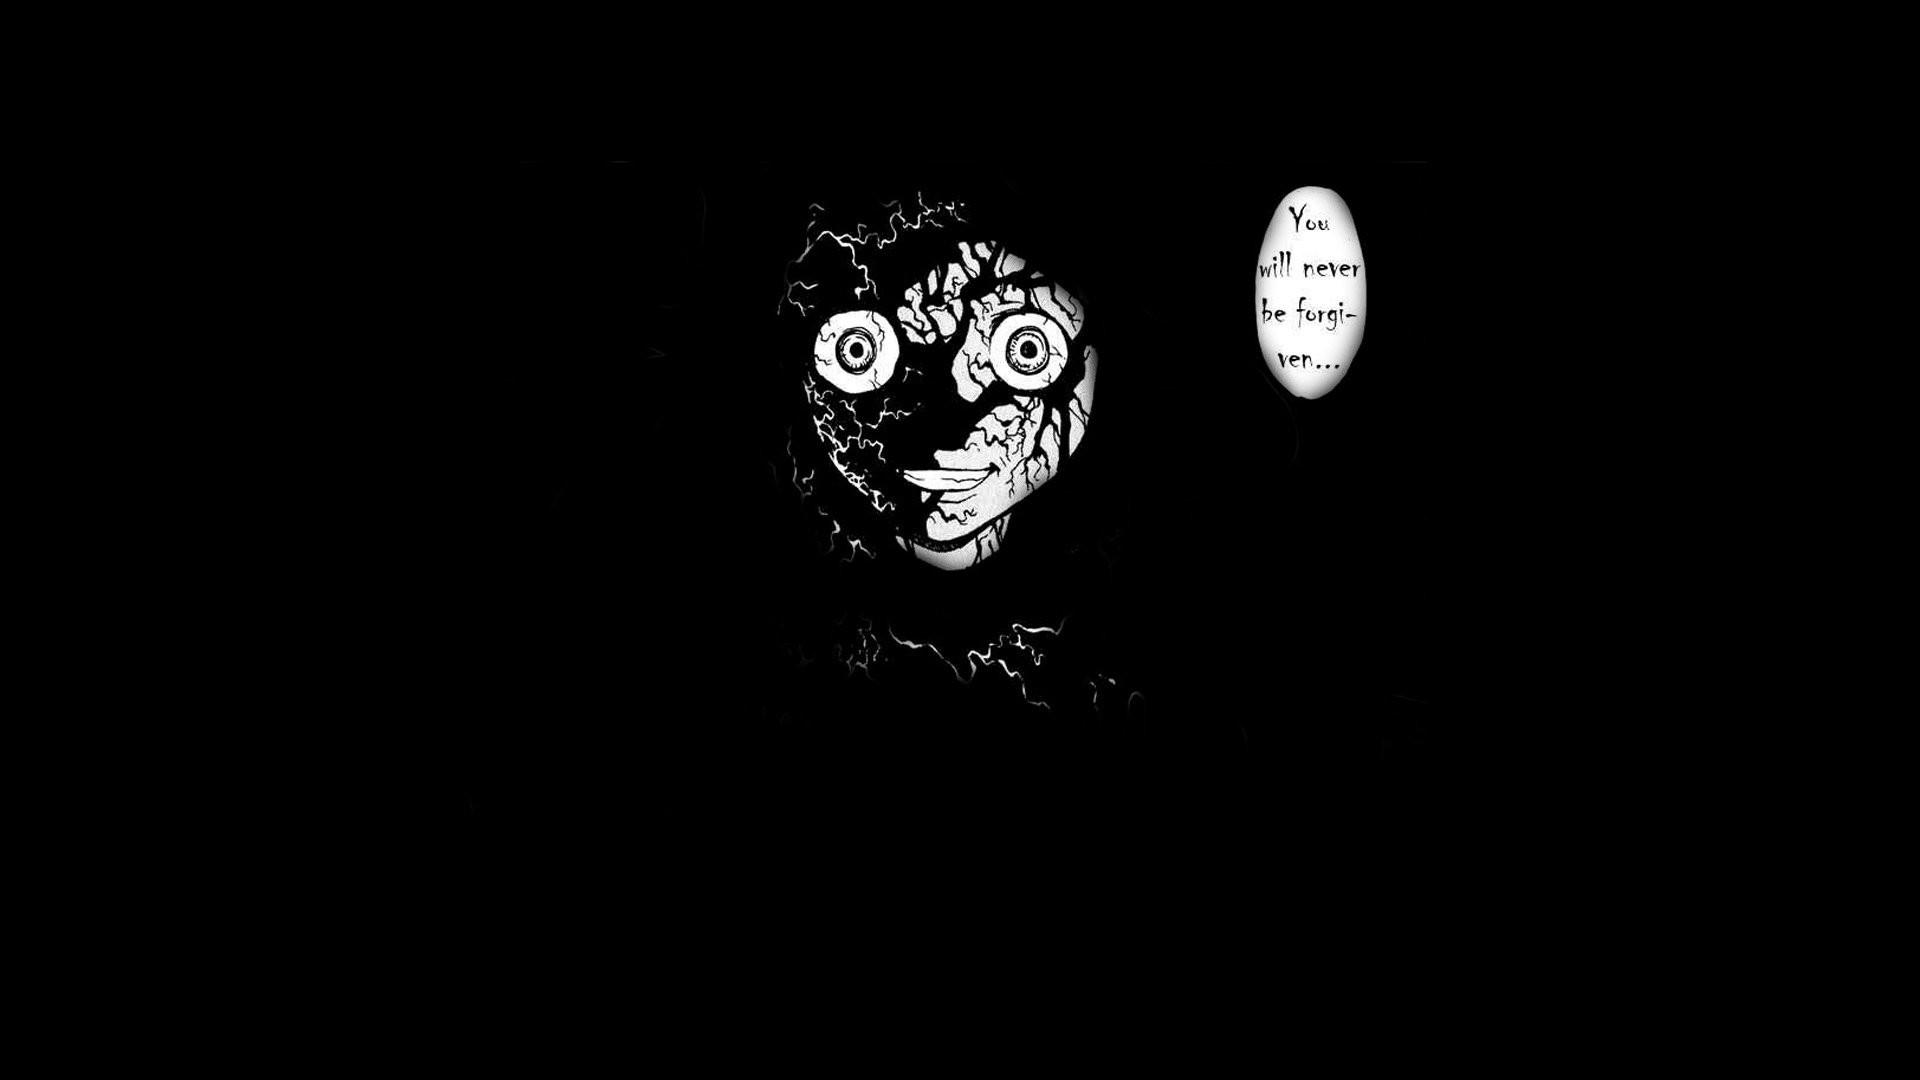 dark anime iphone wallpaper images